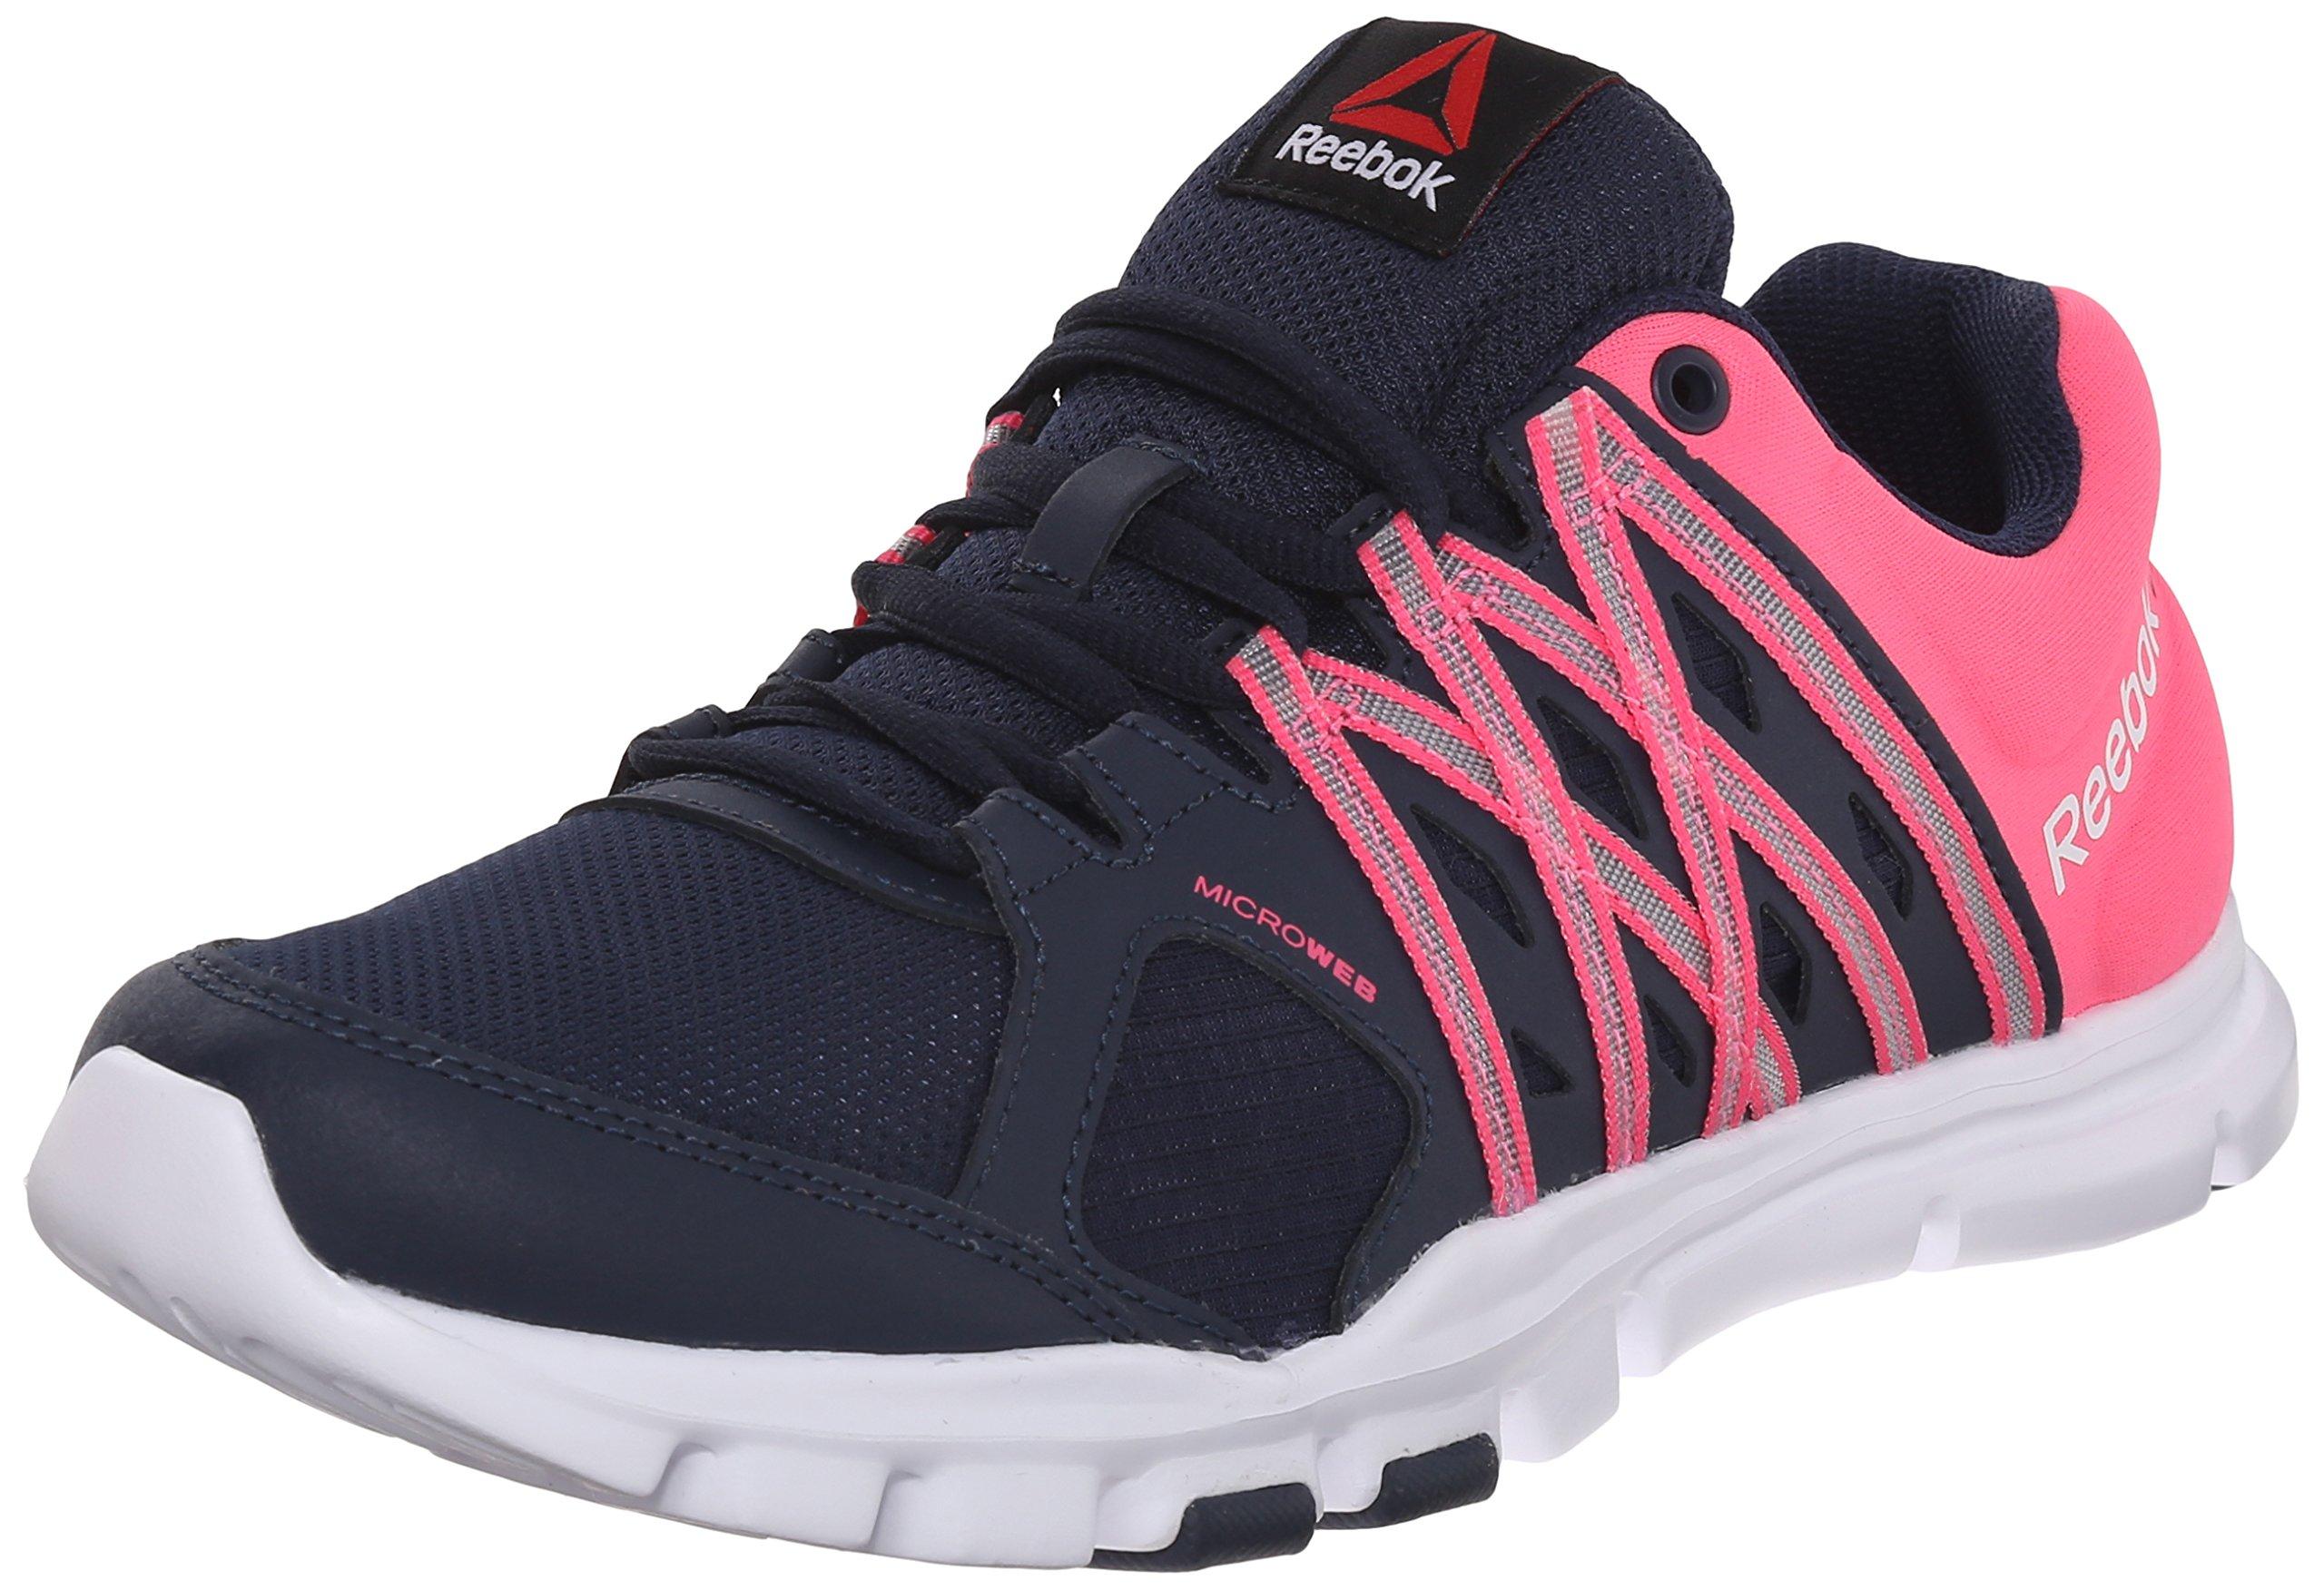 Reebok Women's Yourflex Trainette 8.0L MT Training Shoe, Collegiate Navy/Solar Pink/White, 9 M US